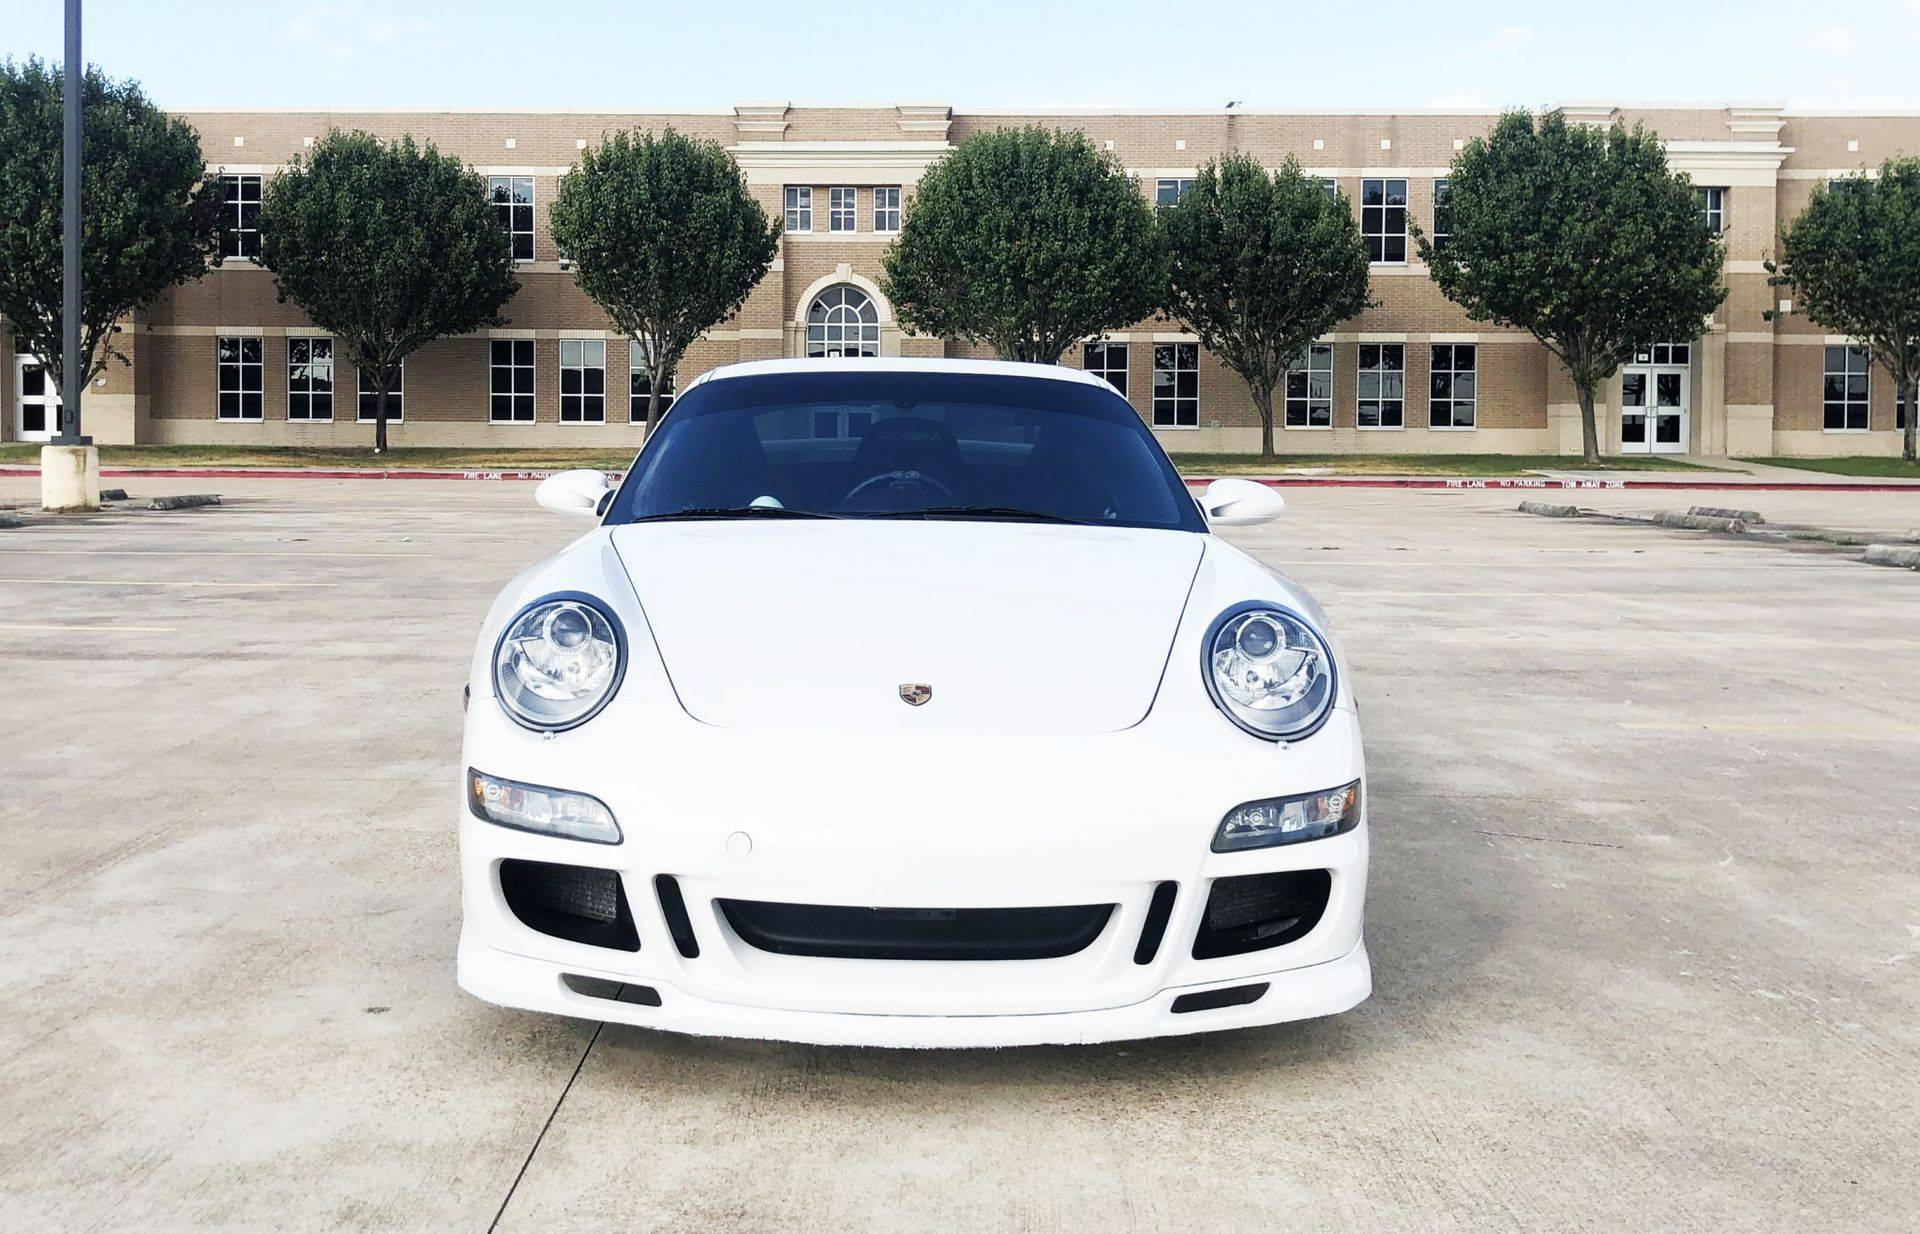 Center-Seat-Porsche-911-Carrera-S-2008-49